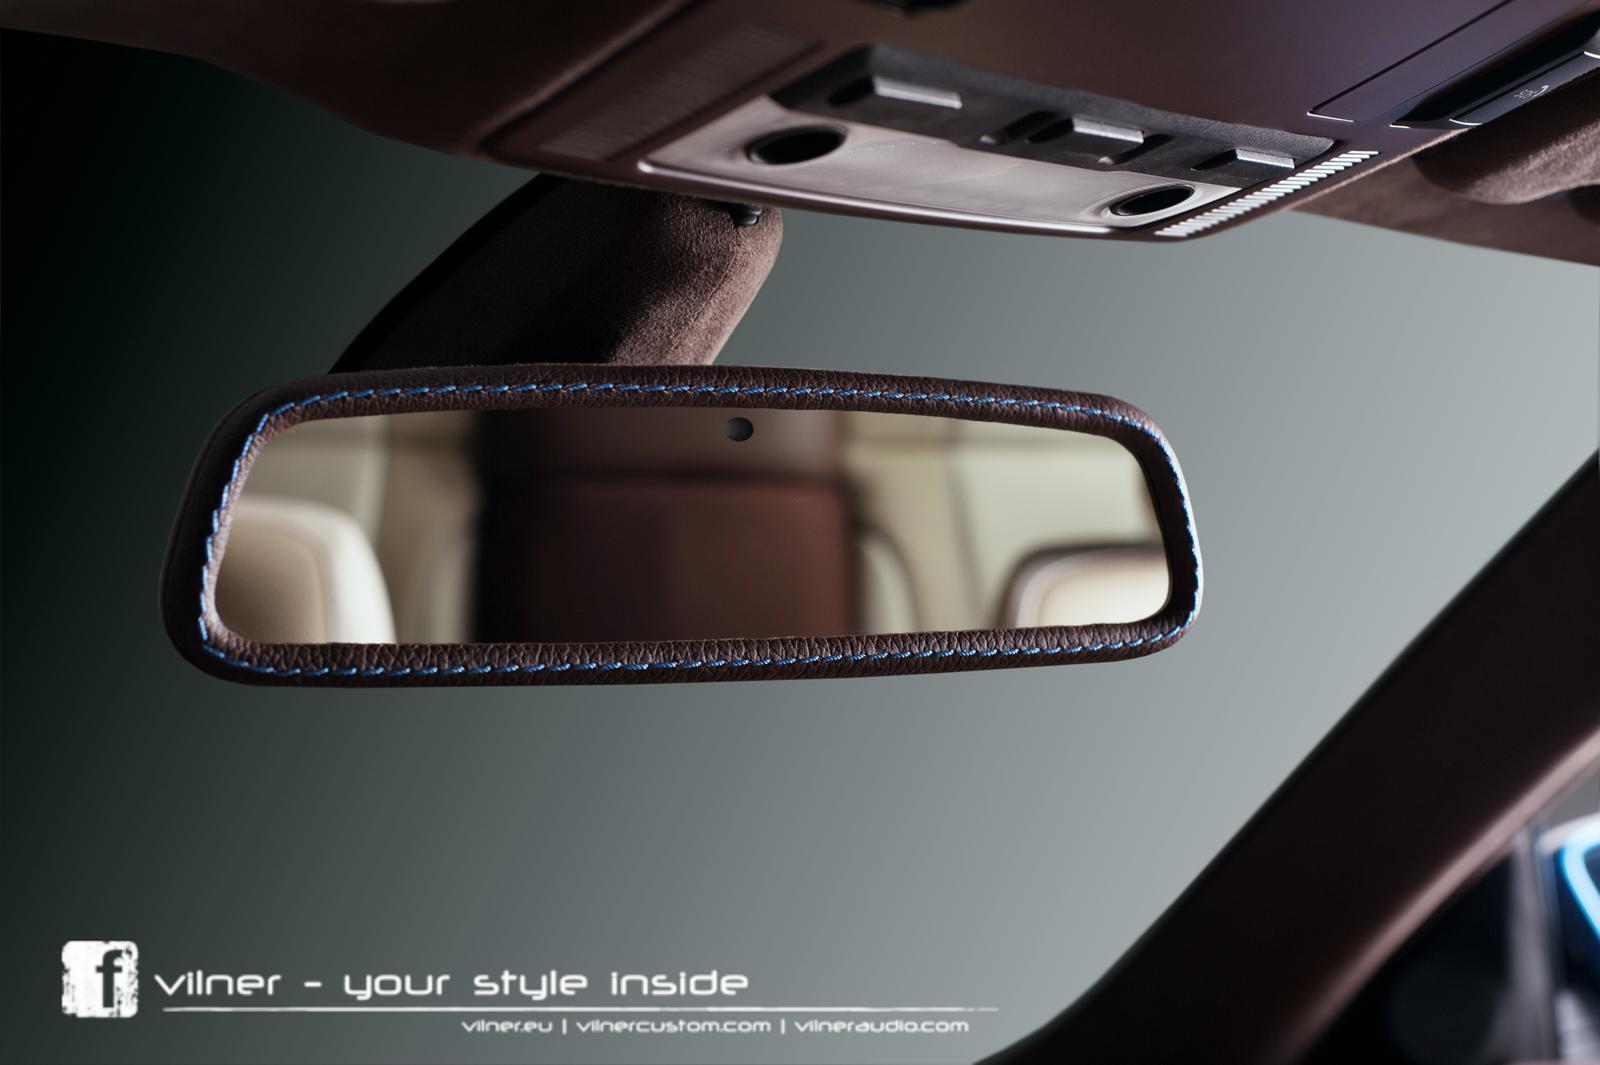 vilner tuned bmw 6 series bullshark interior rear view mirror. Black Bedroom Furniture Sets. Home Design Ideas